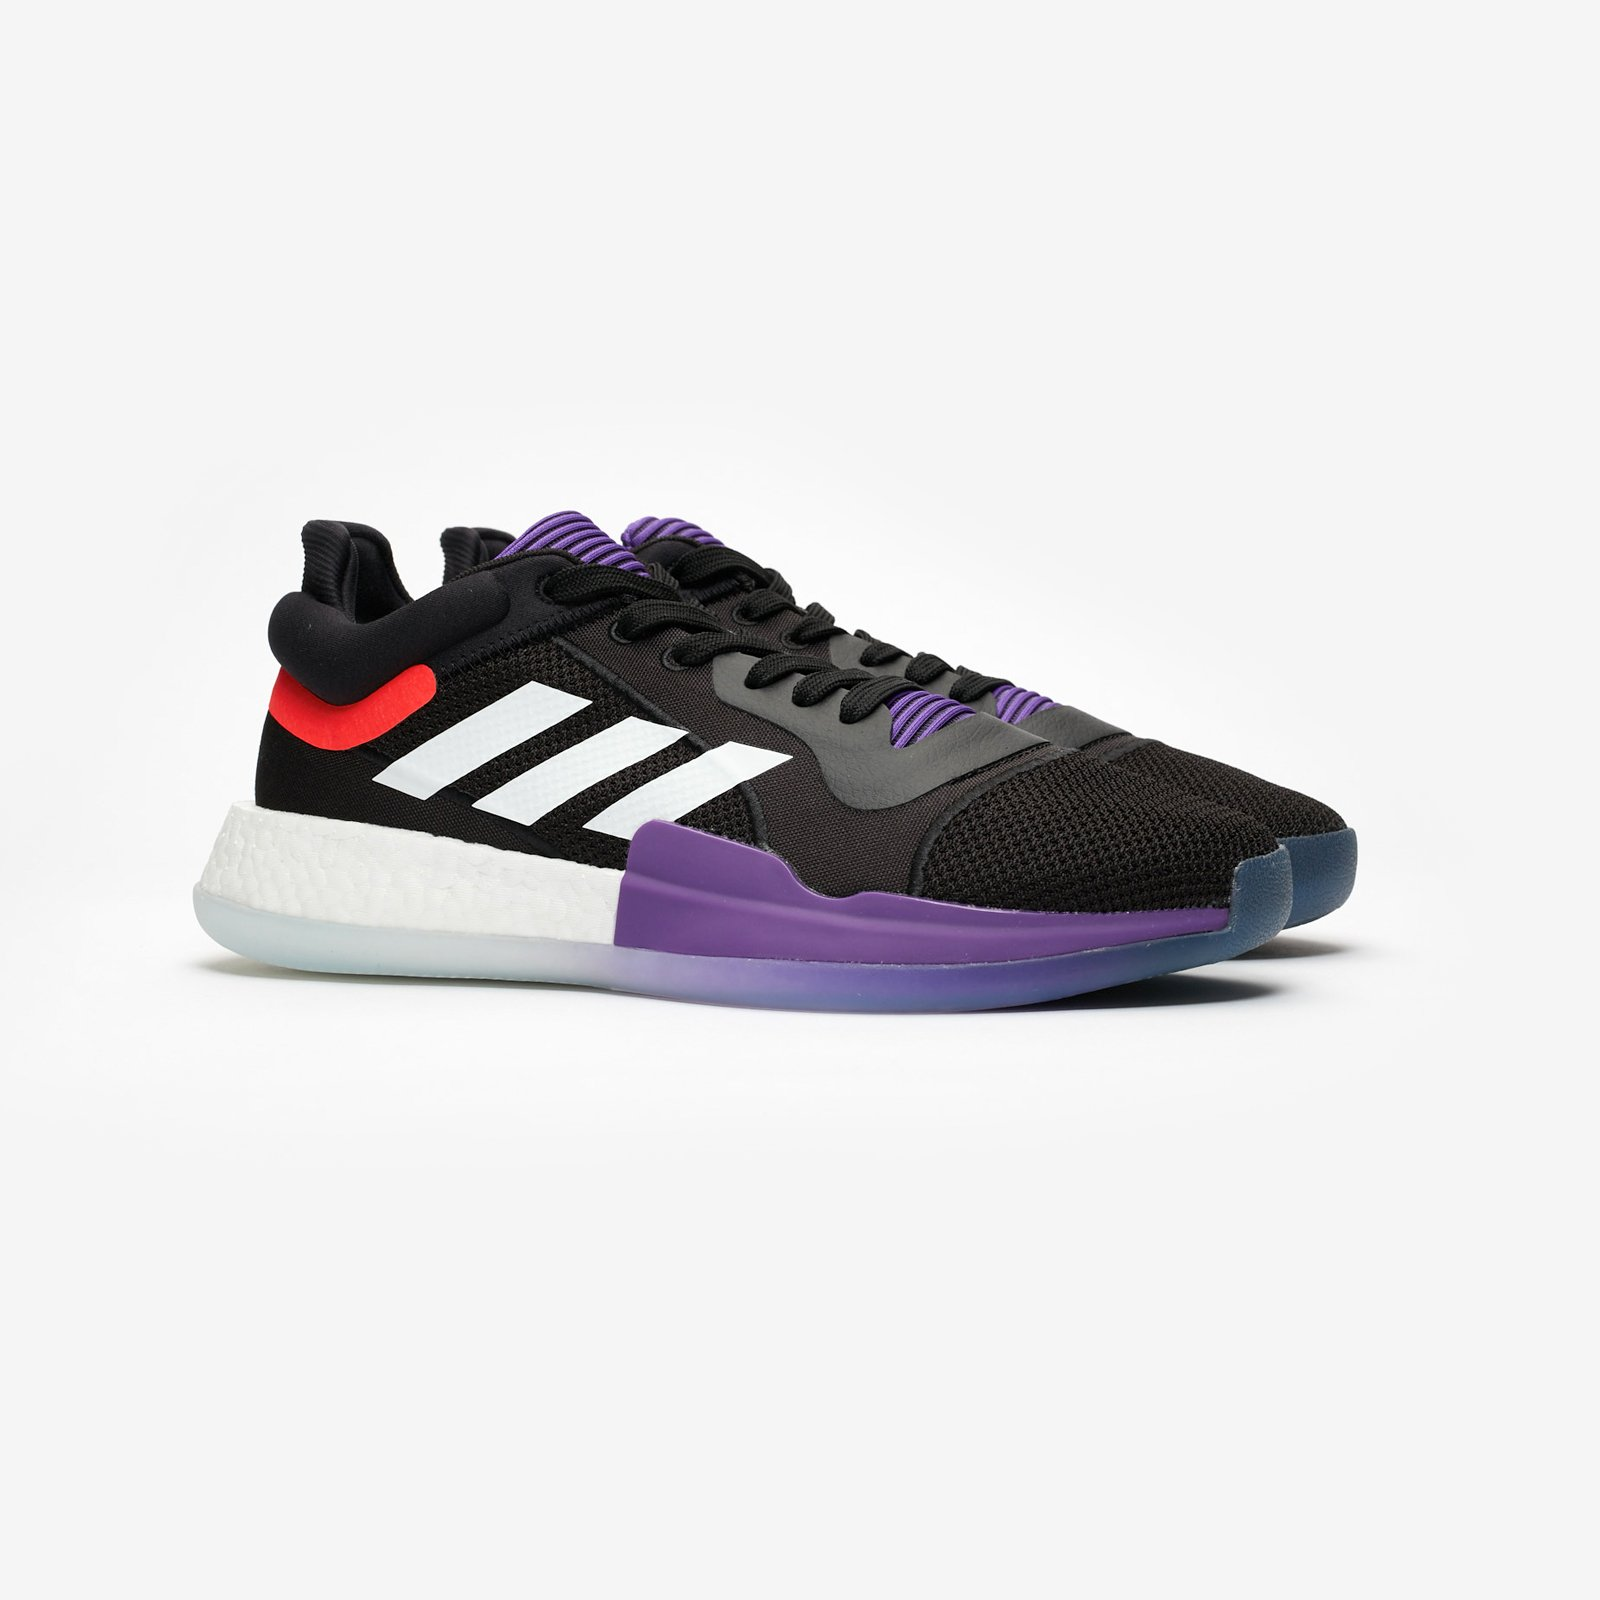 af1d7fe2f8f adidas Marquee Boost Low - Ee8571 - Sneakersnstuff